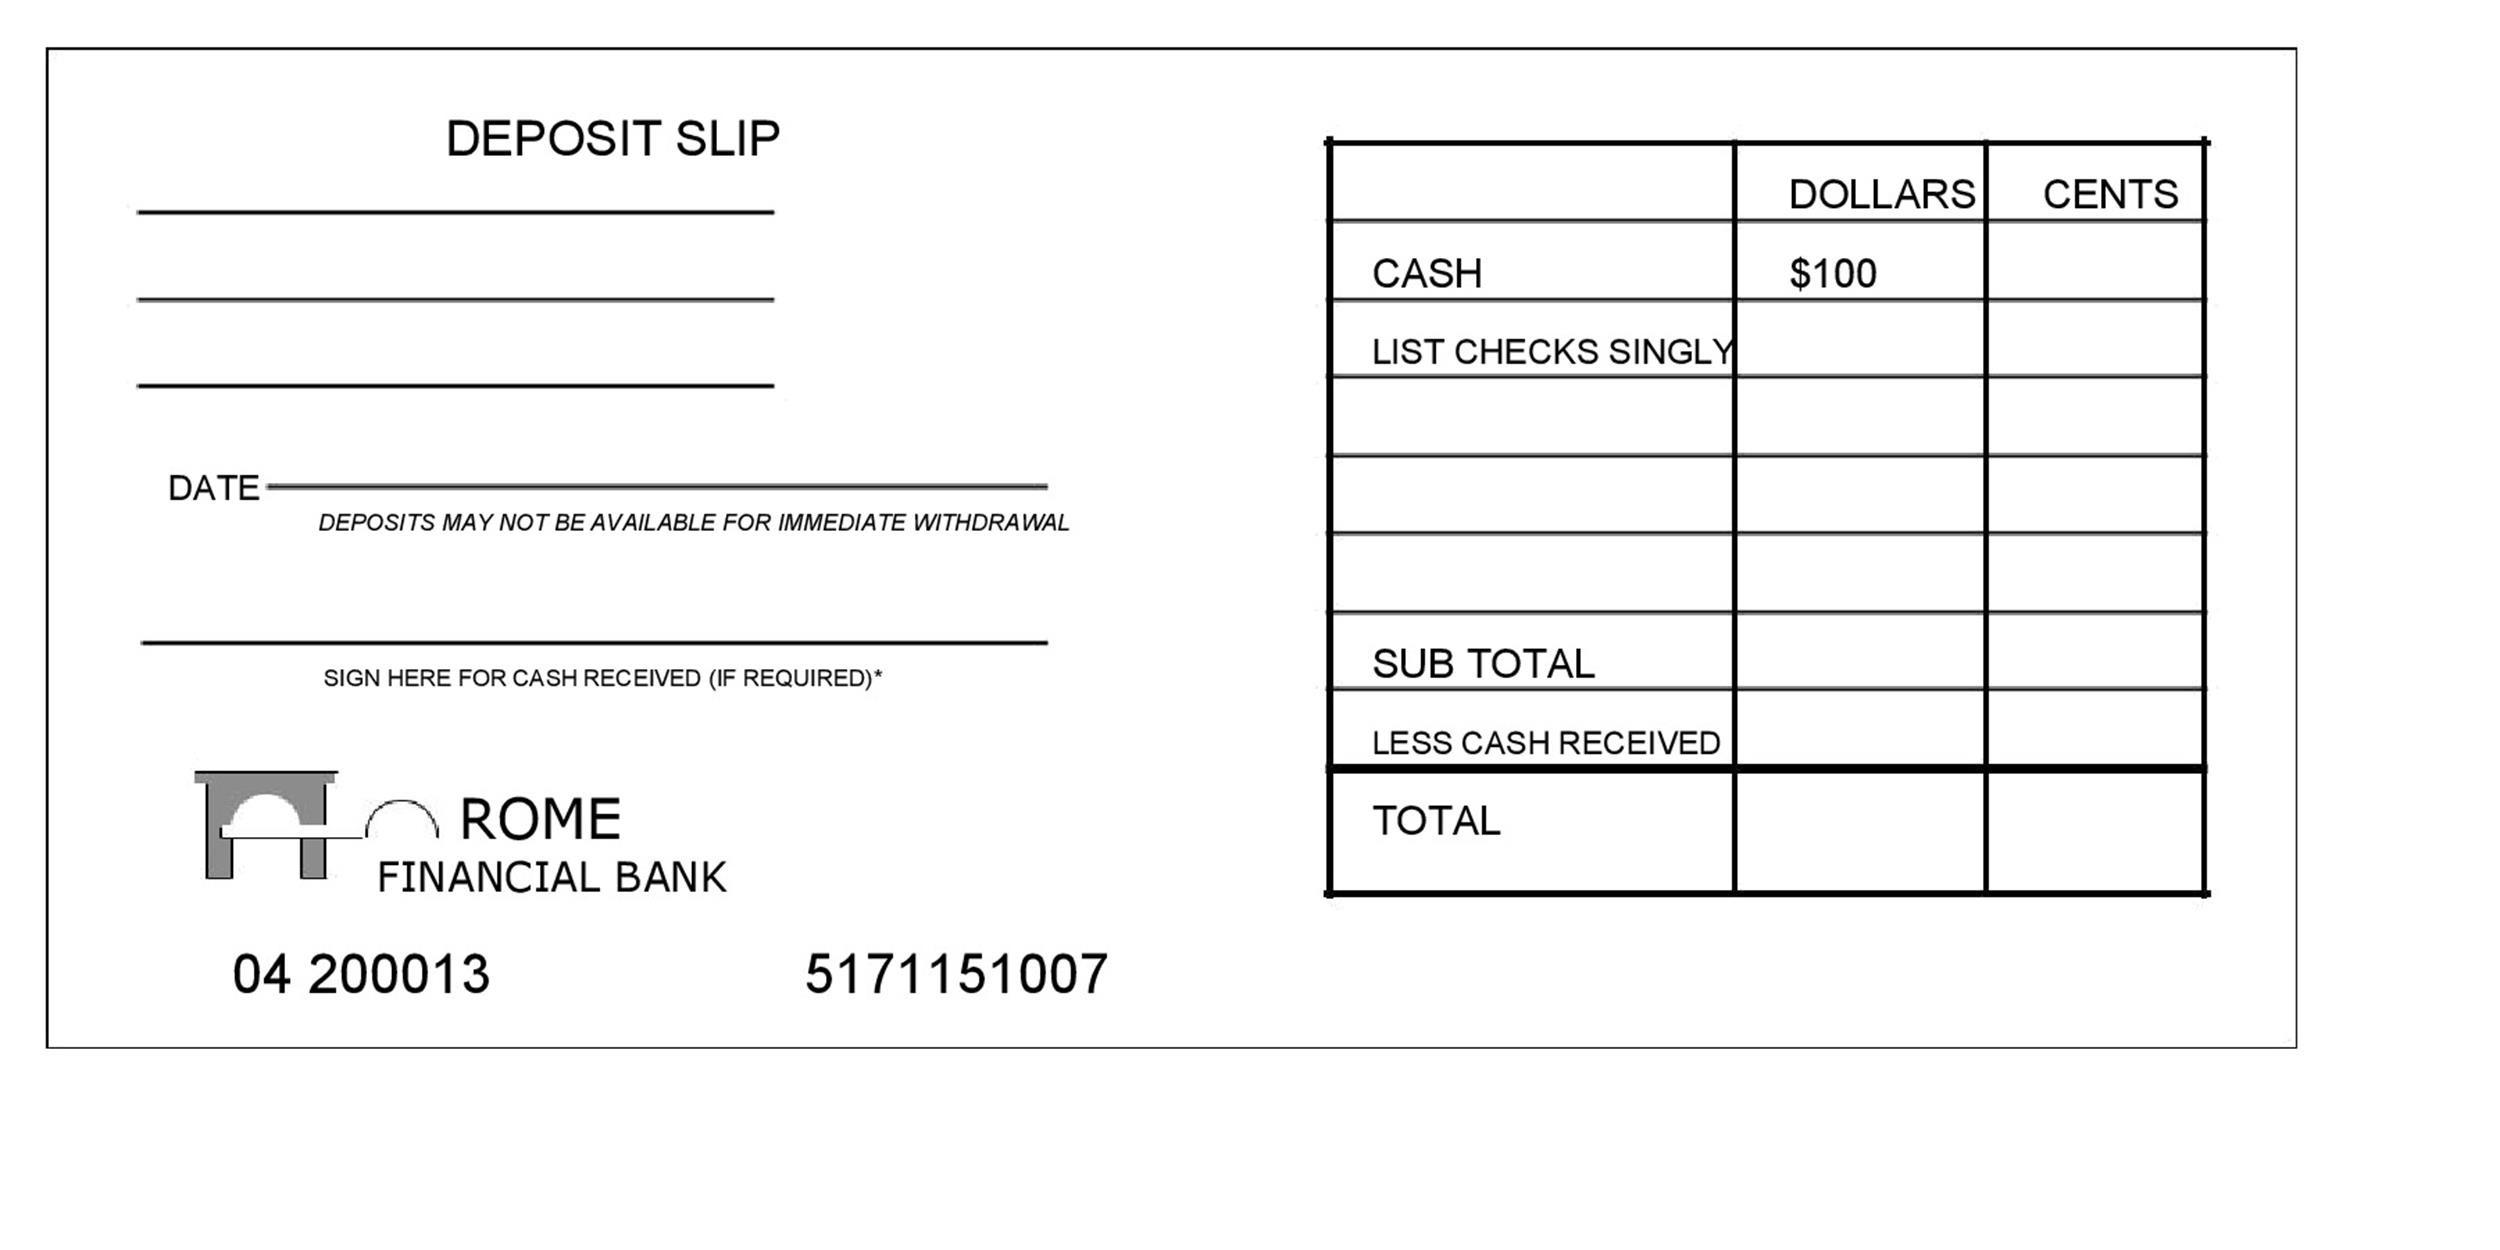 37 Bank Deposit Slip Templates Amp Examples Templatelab